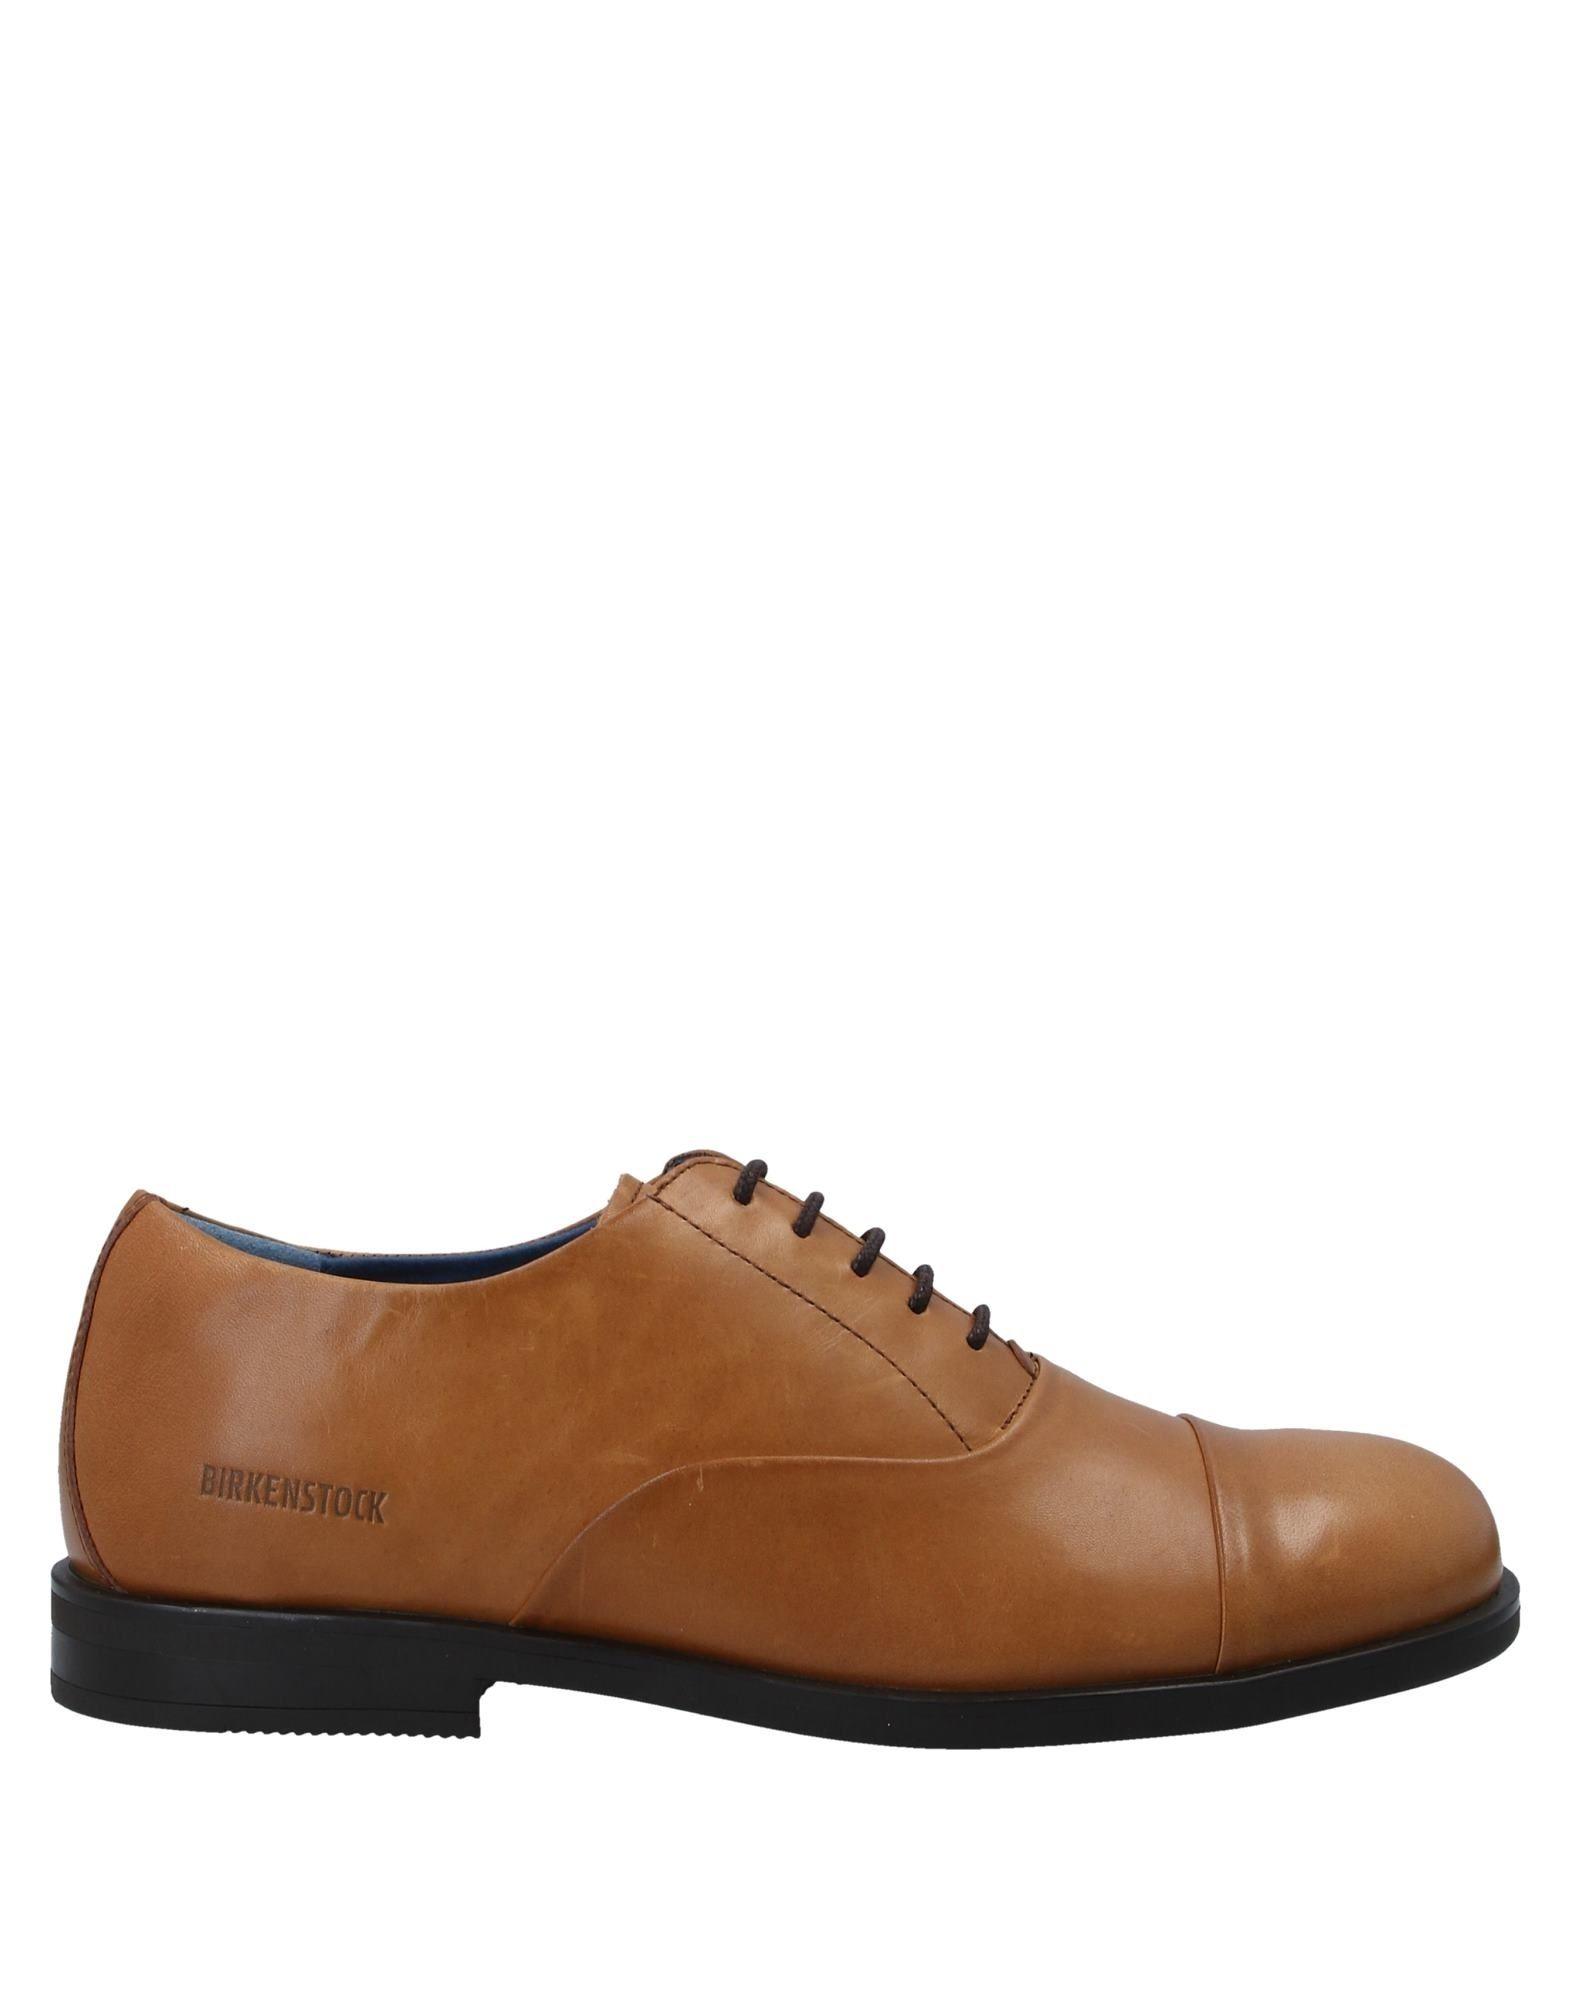 BIRKENSTOCK Обувь на шнурках обувь birkenstock магазины в москве